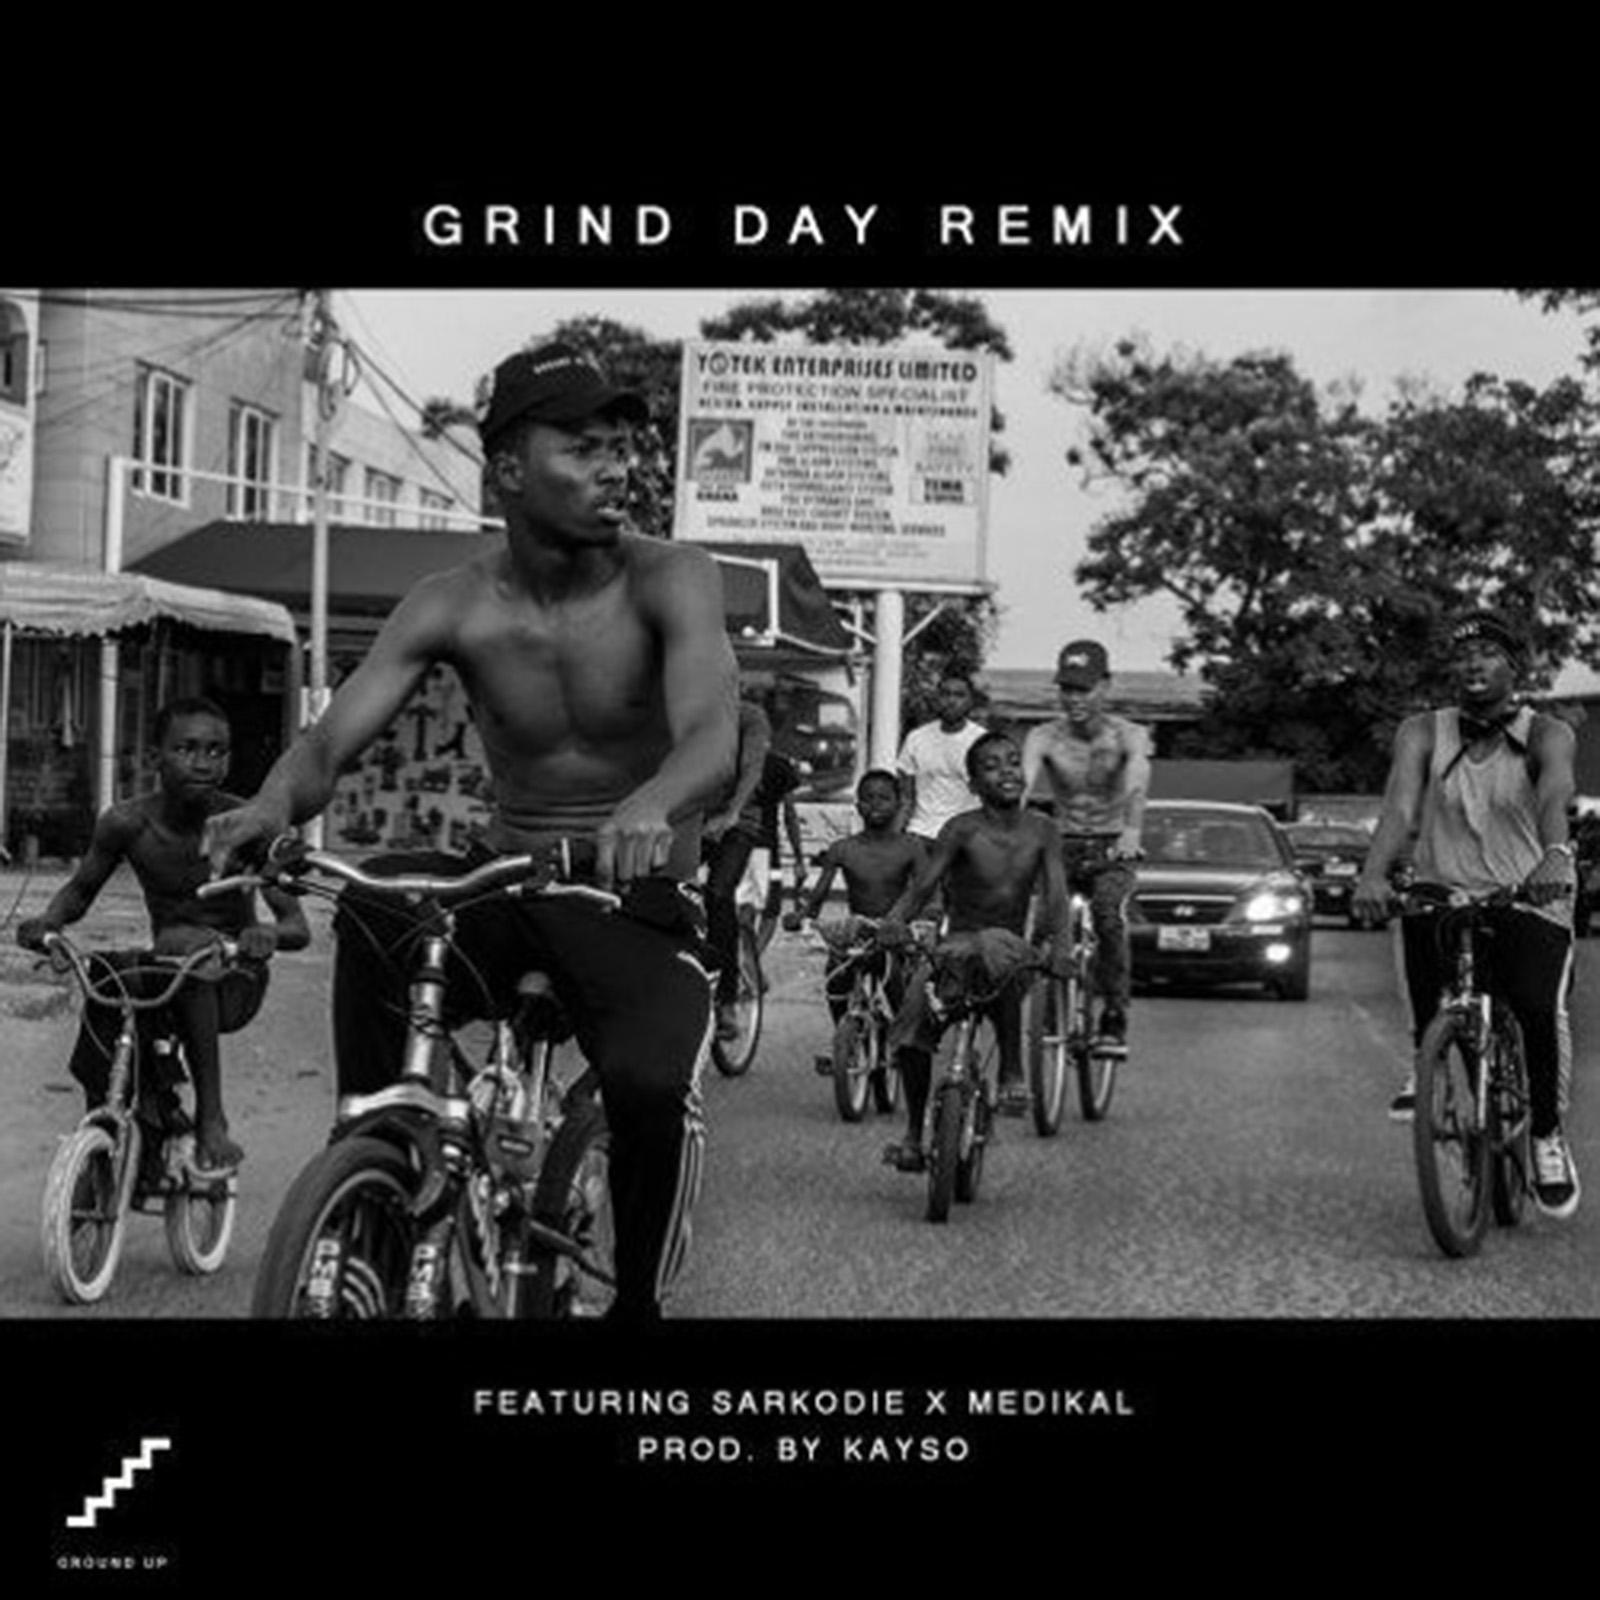 Grind Day remix by Kwesi Arthur feat. Sarkodie & Medikal